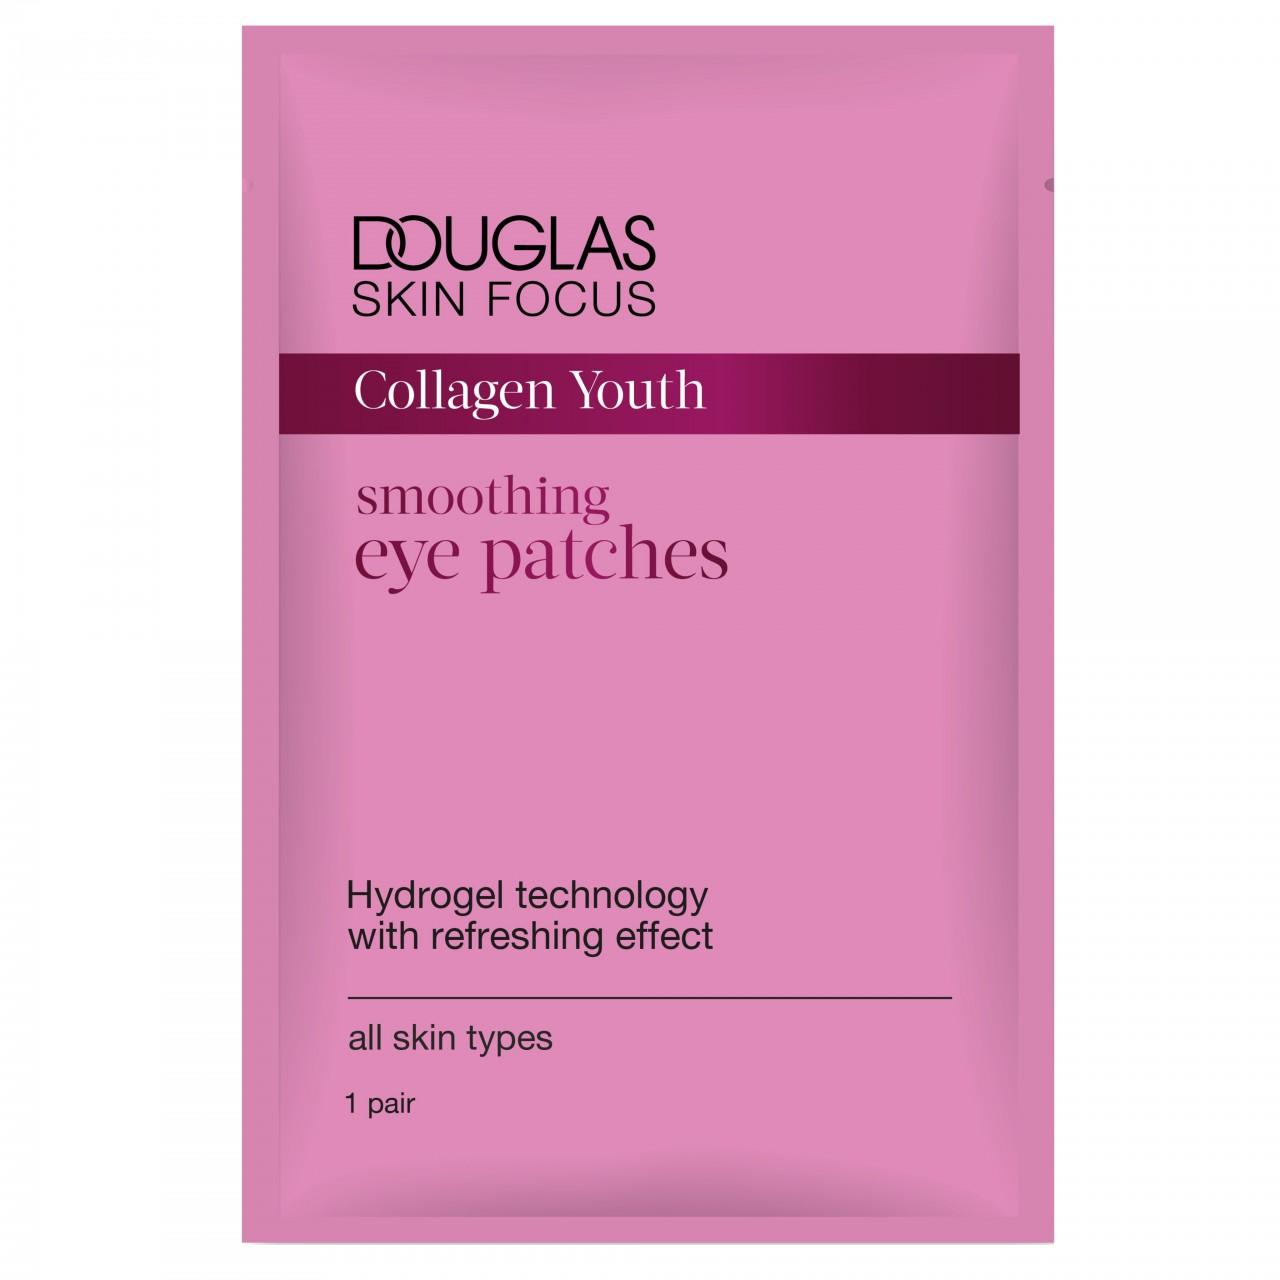 Douglas Focus Smoothing Eye Patches